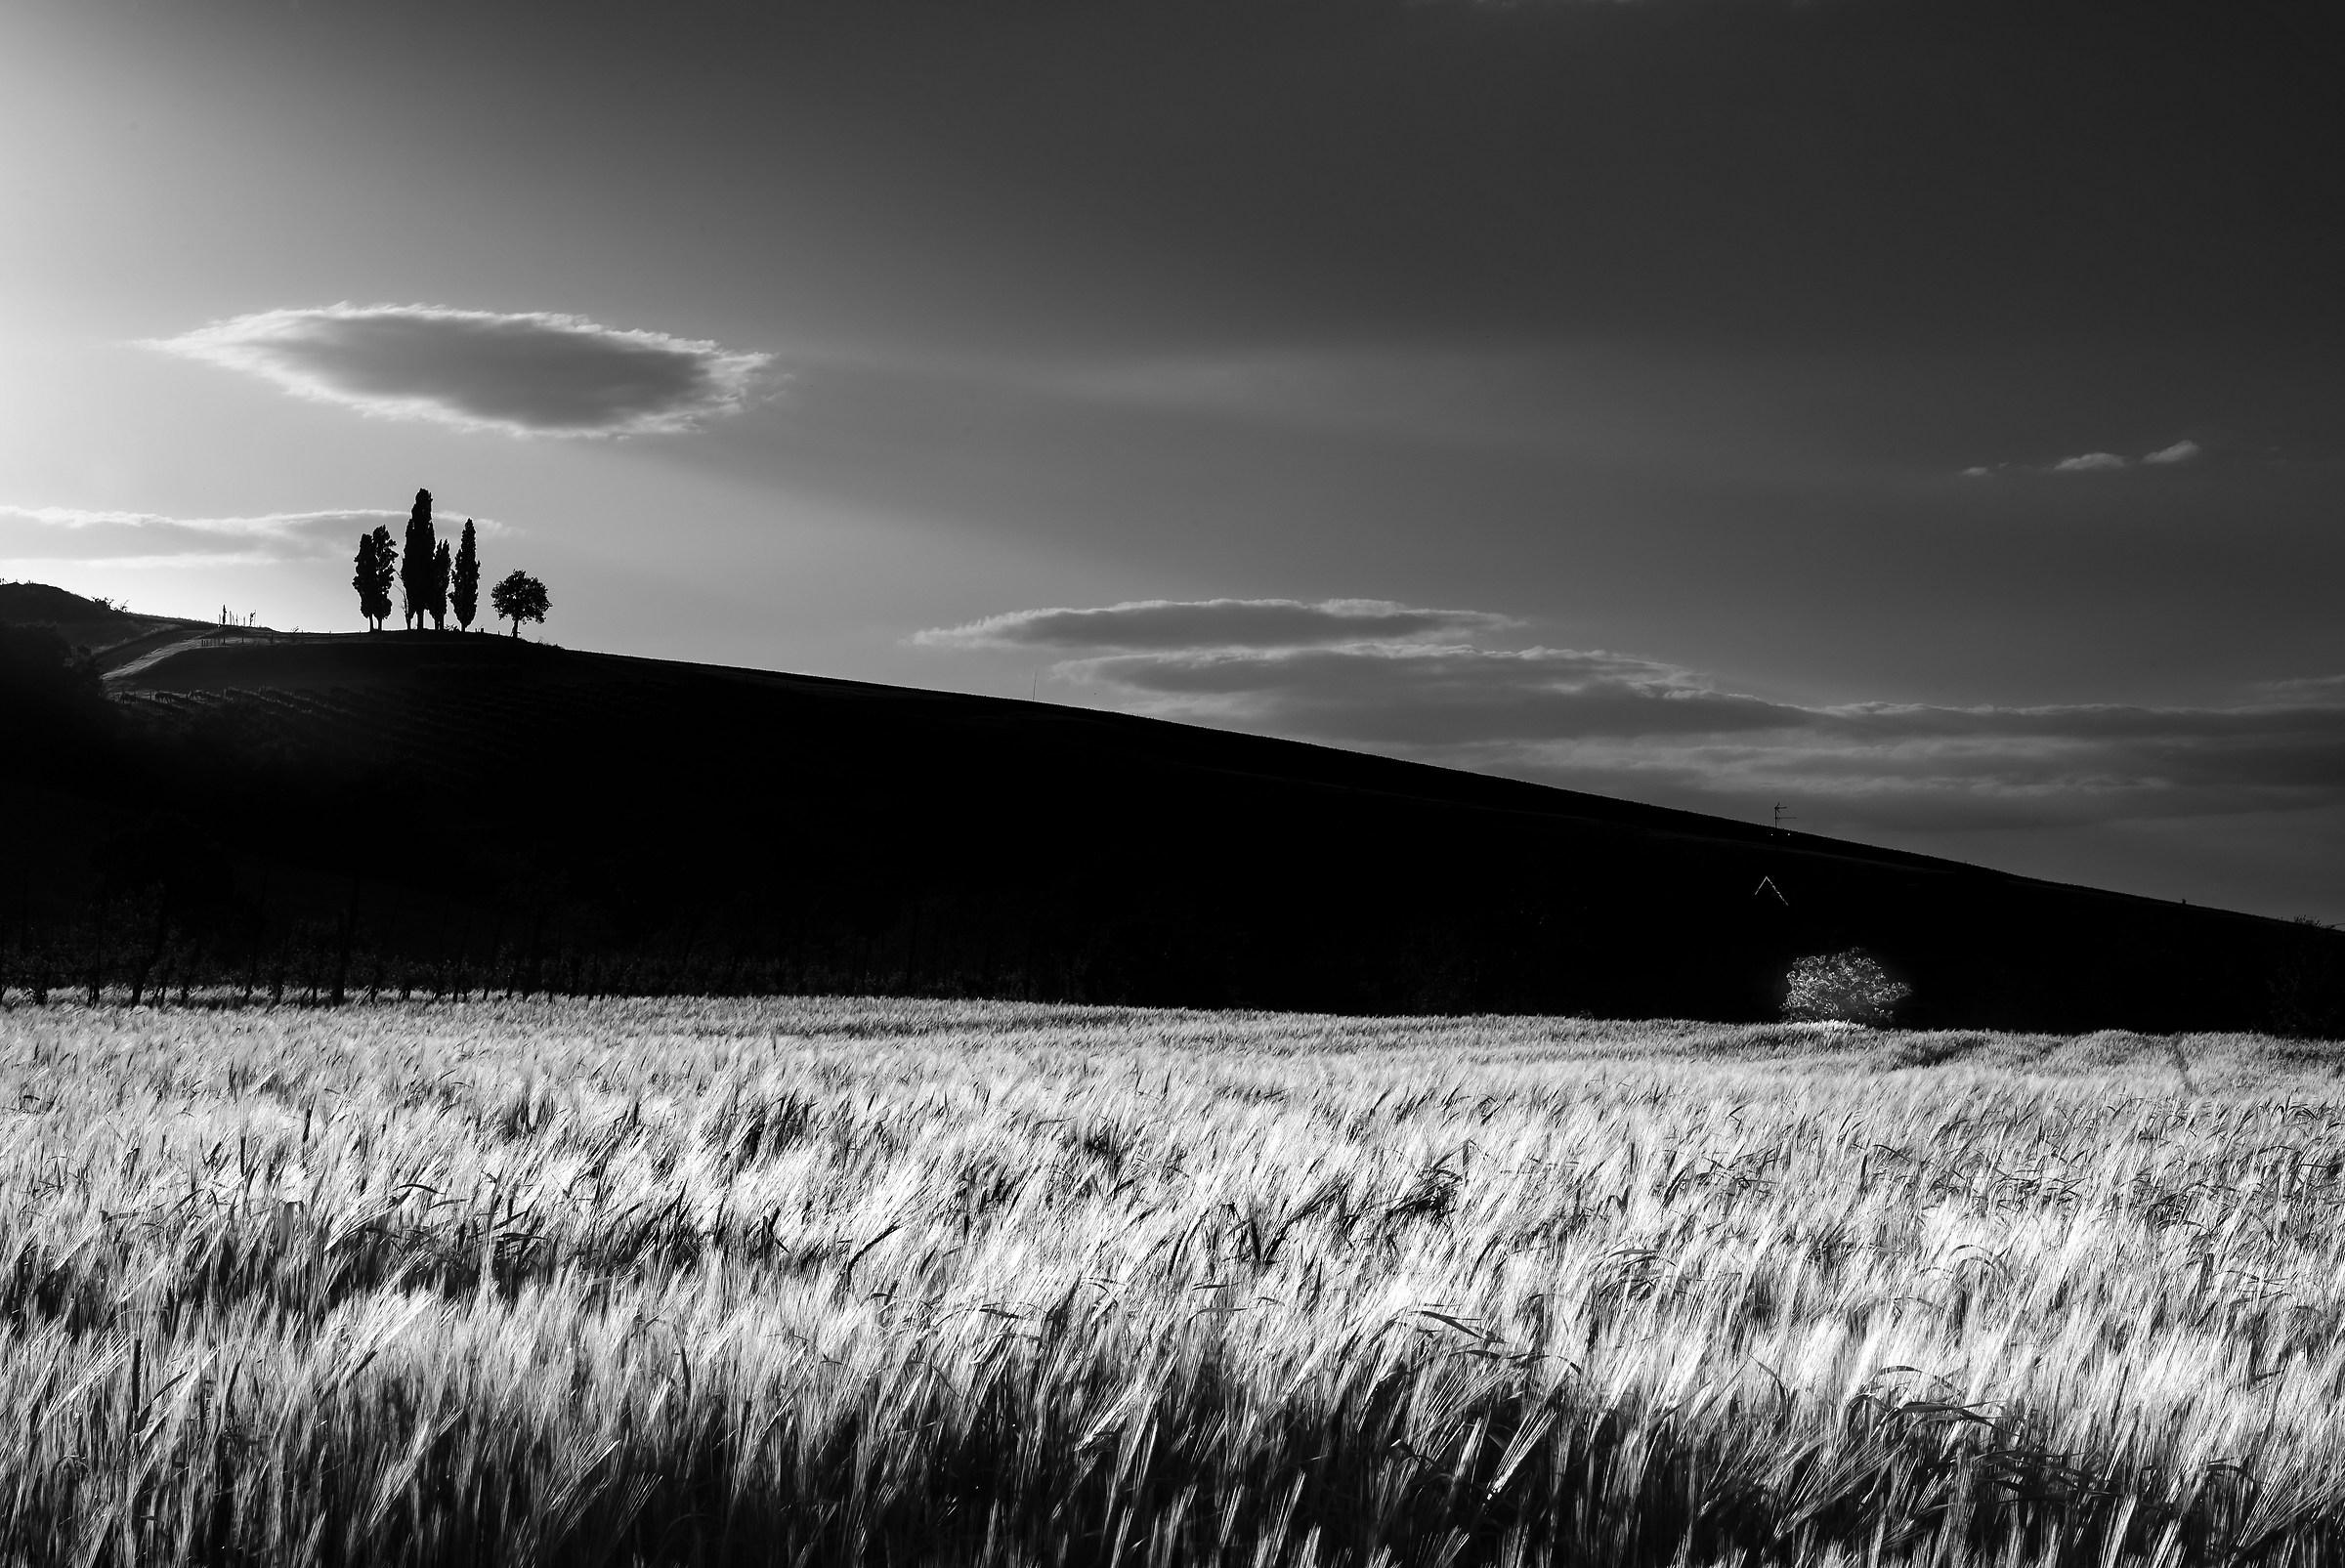 The sentries....